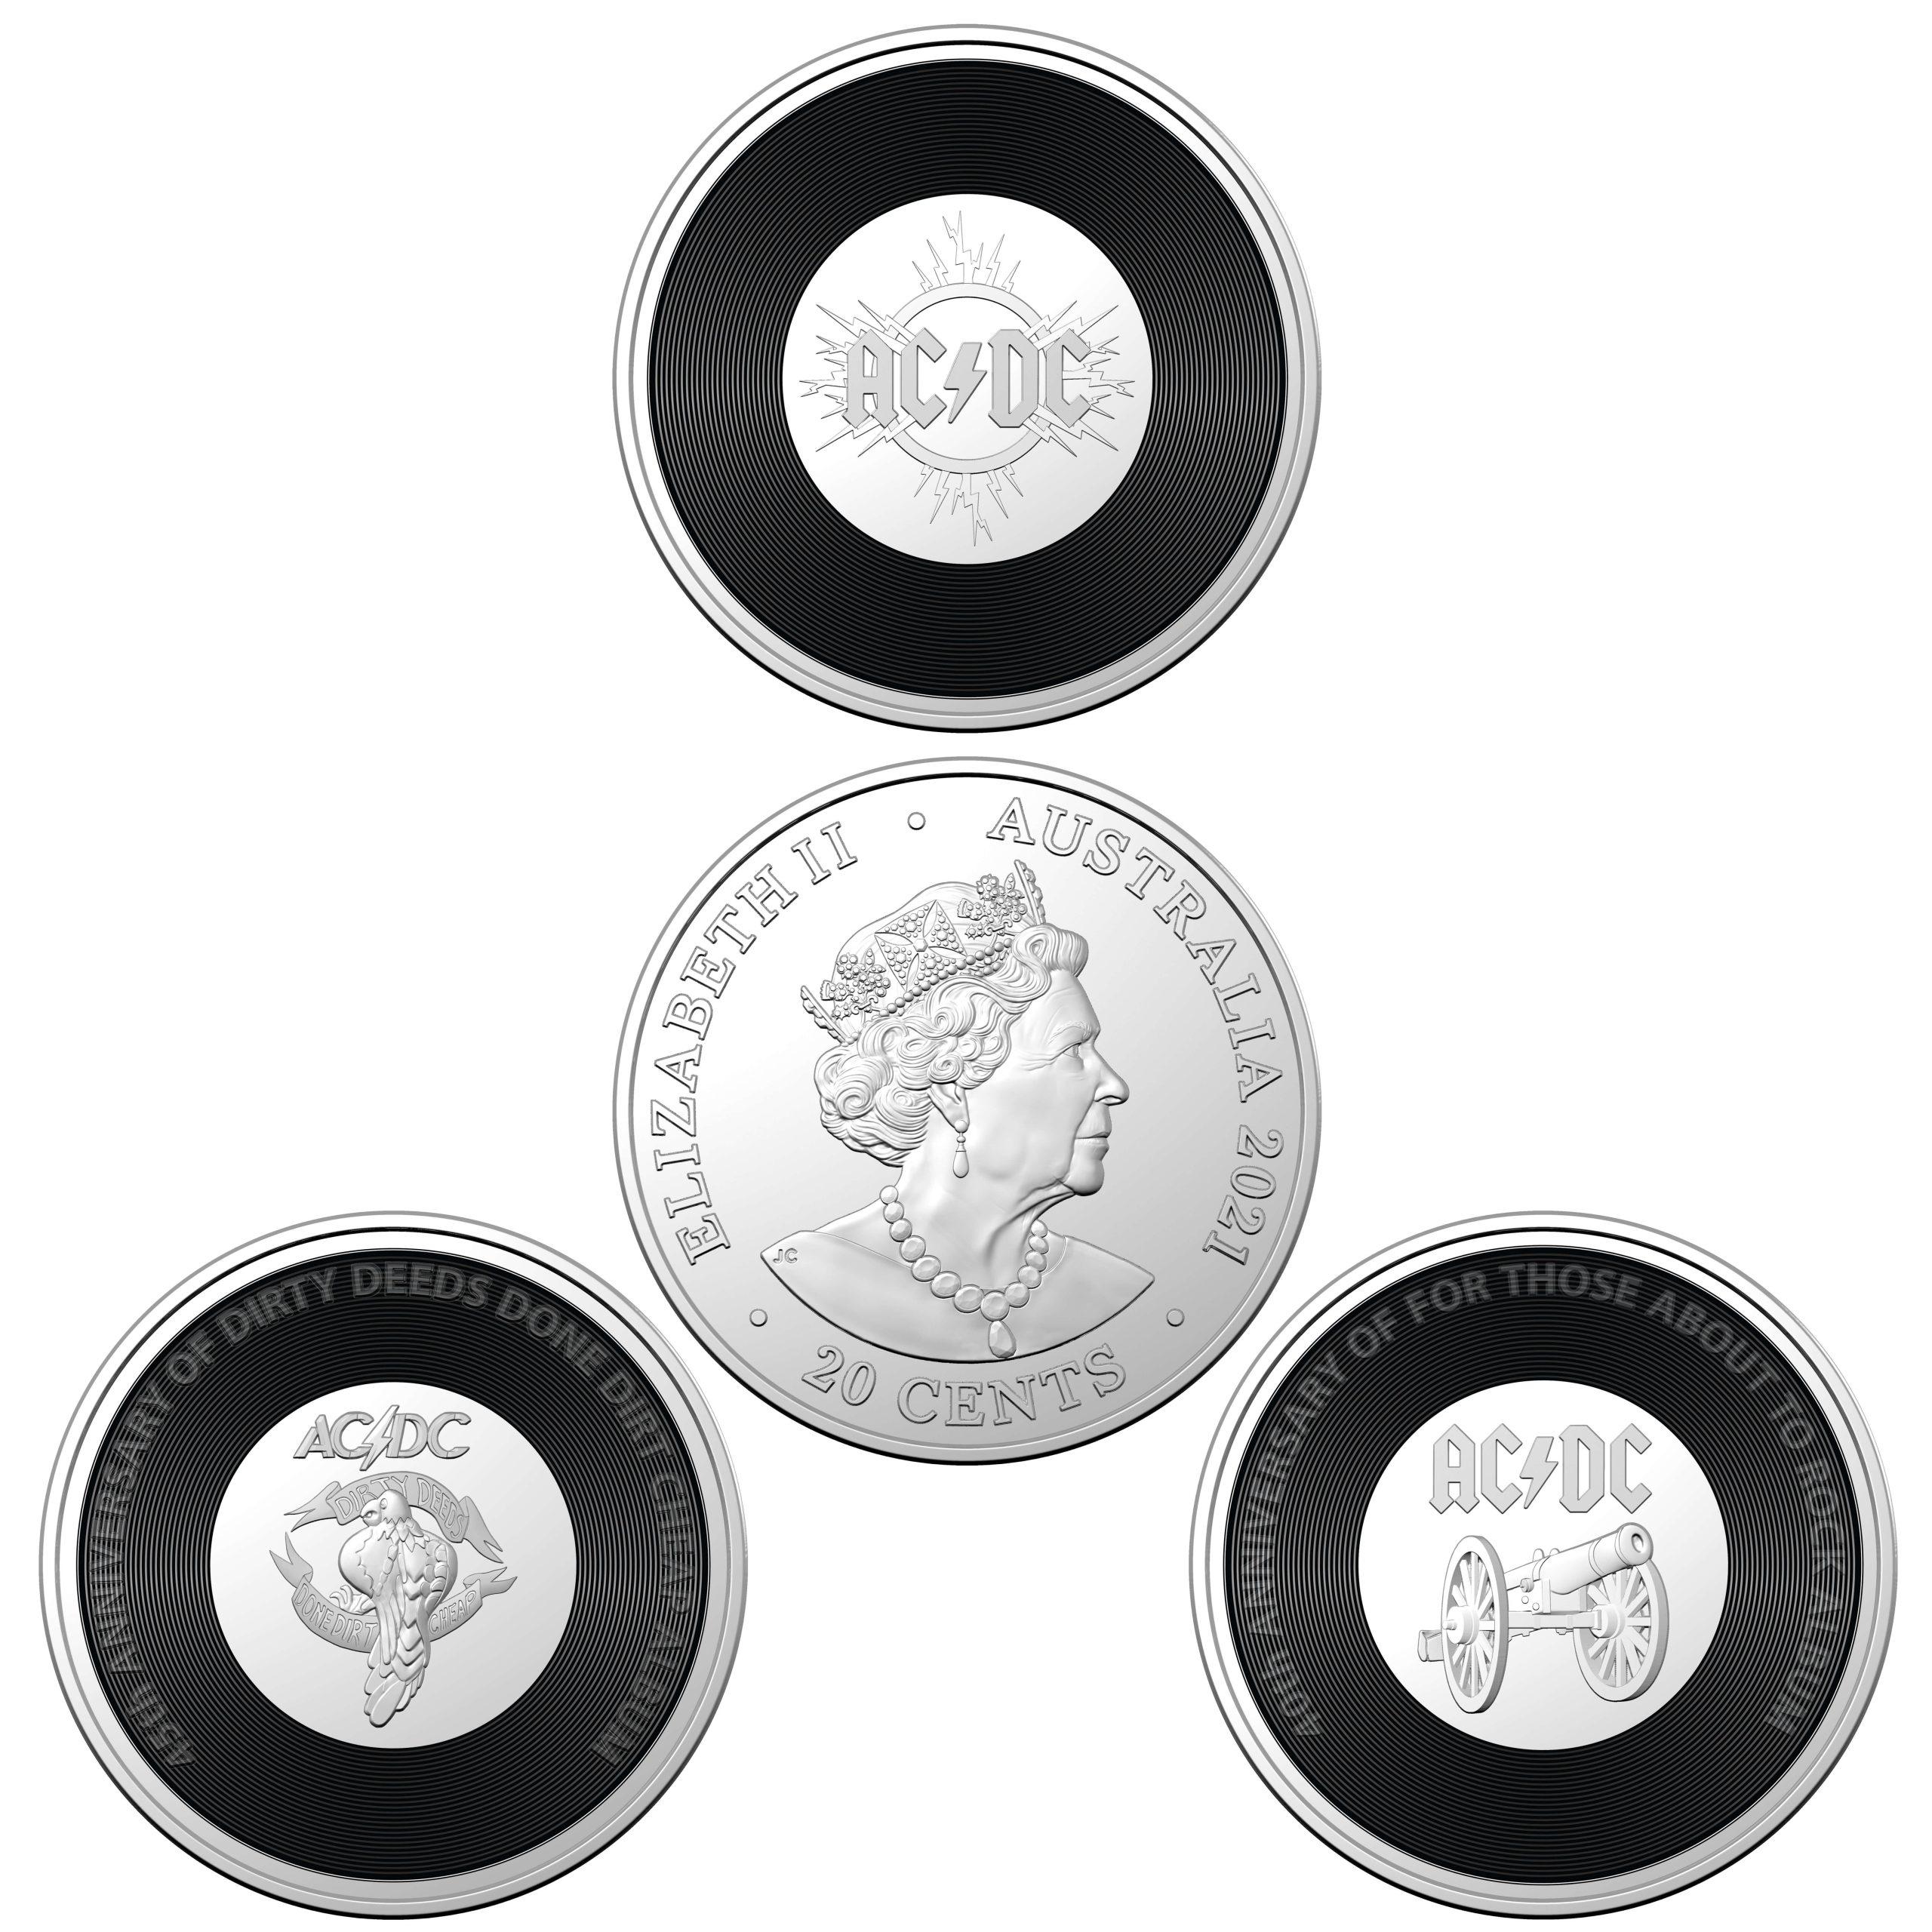 2020/2021 - AC/DC Seven Coin Collection - 20c Coloured CuNi Unc Coins 7